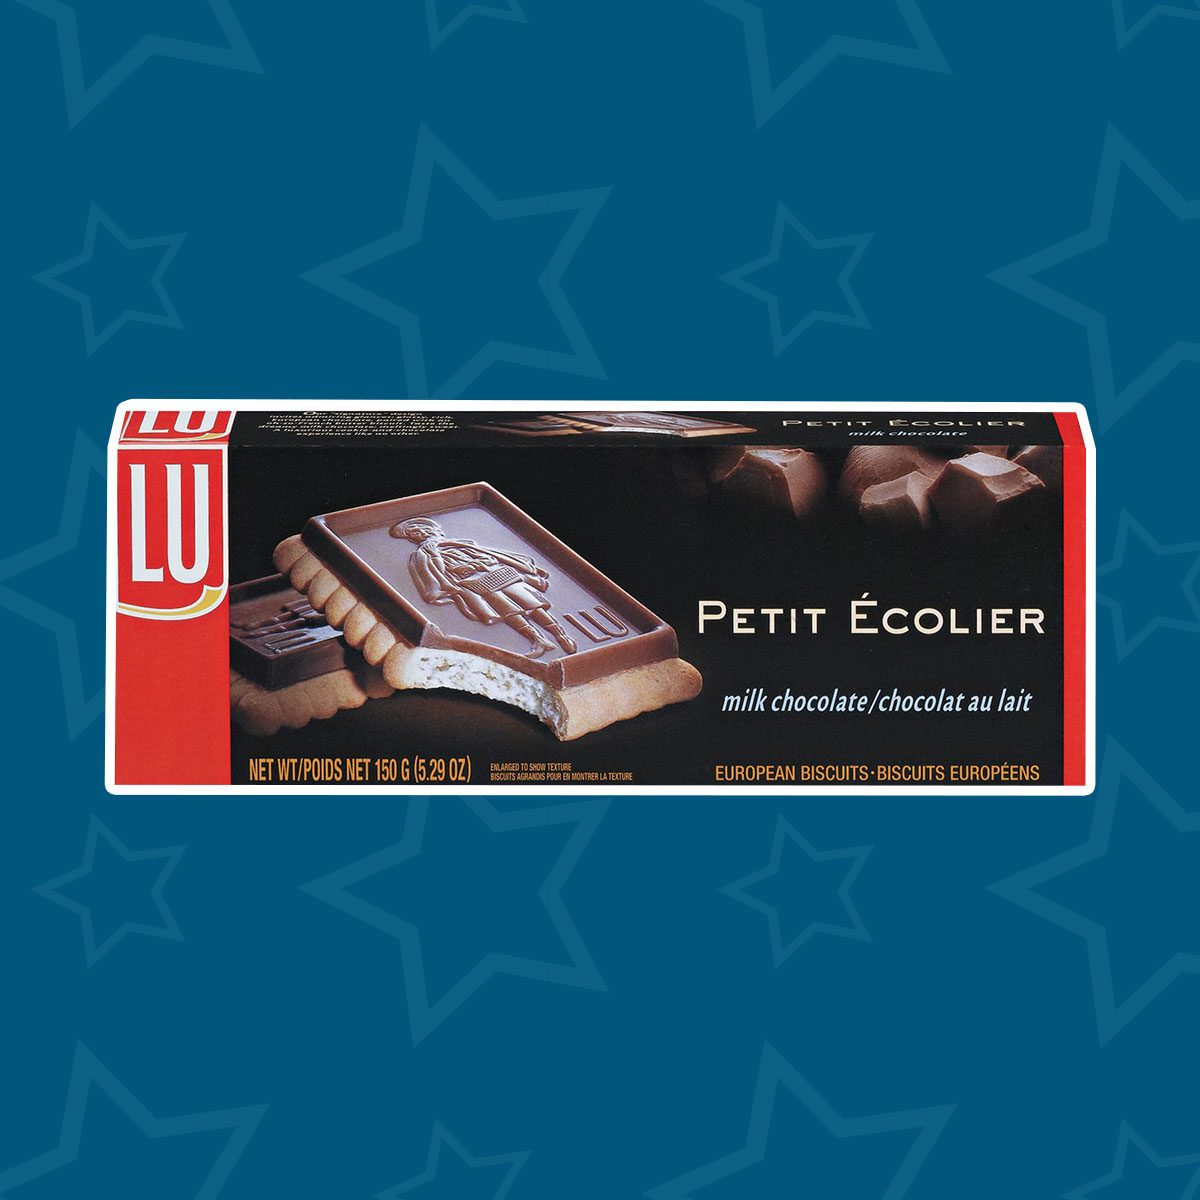 LU Cookies Le Petit Ecolier Milk Chocolate